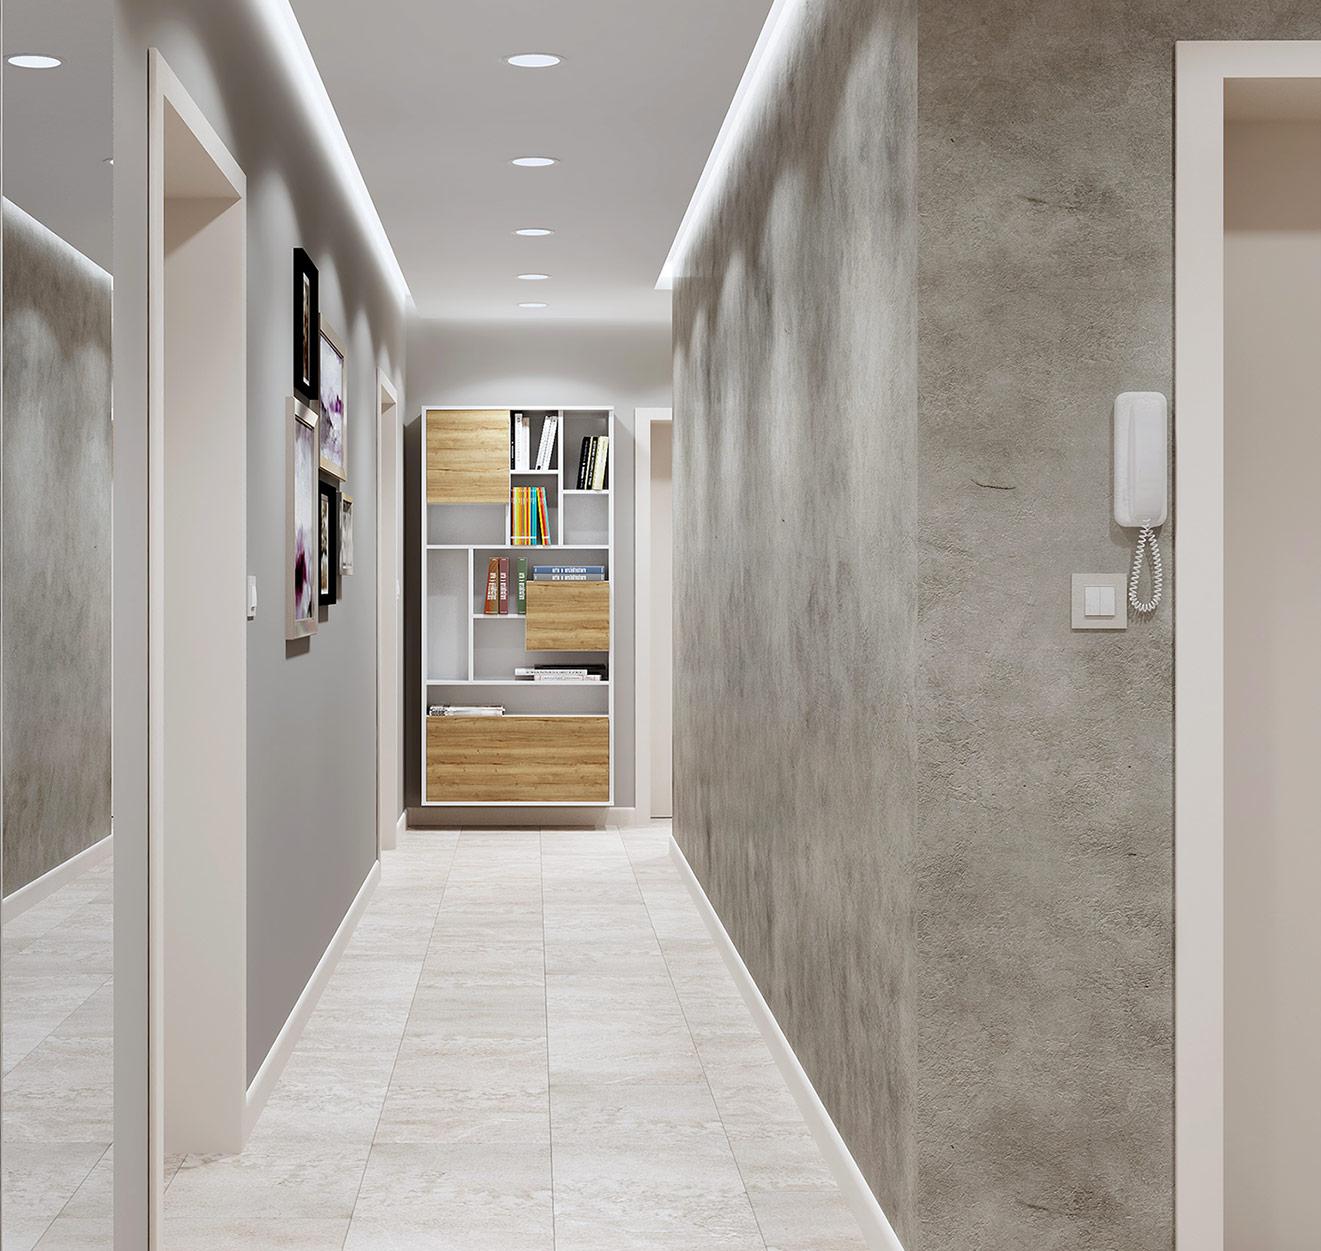 декоративная штукатурка в узком коридоре фото успеете